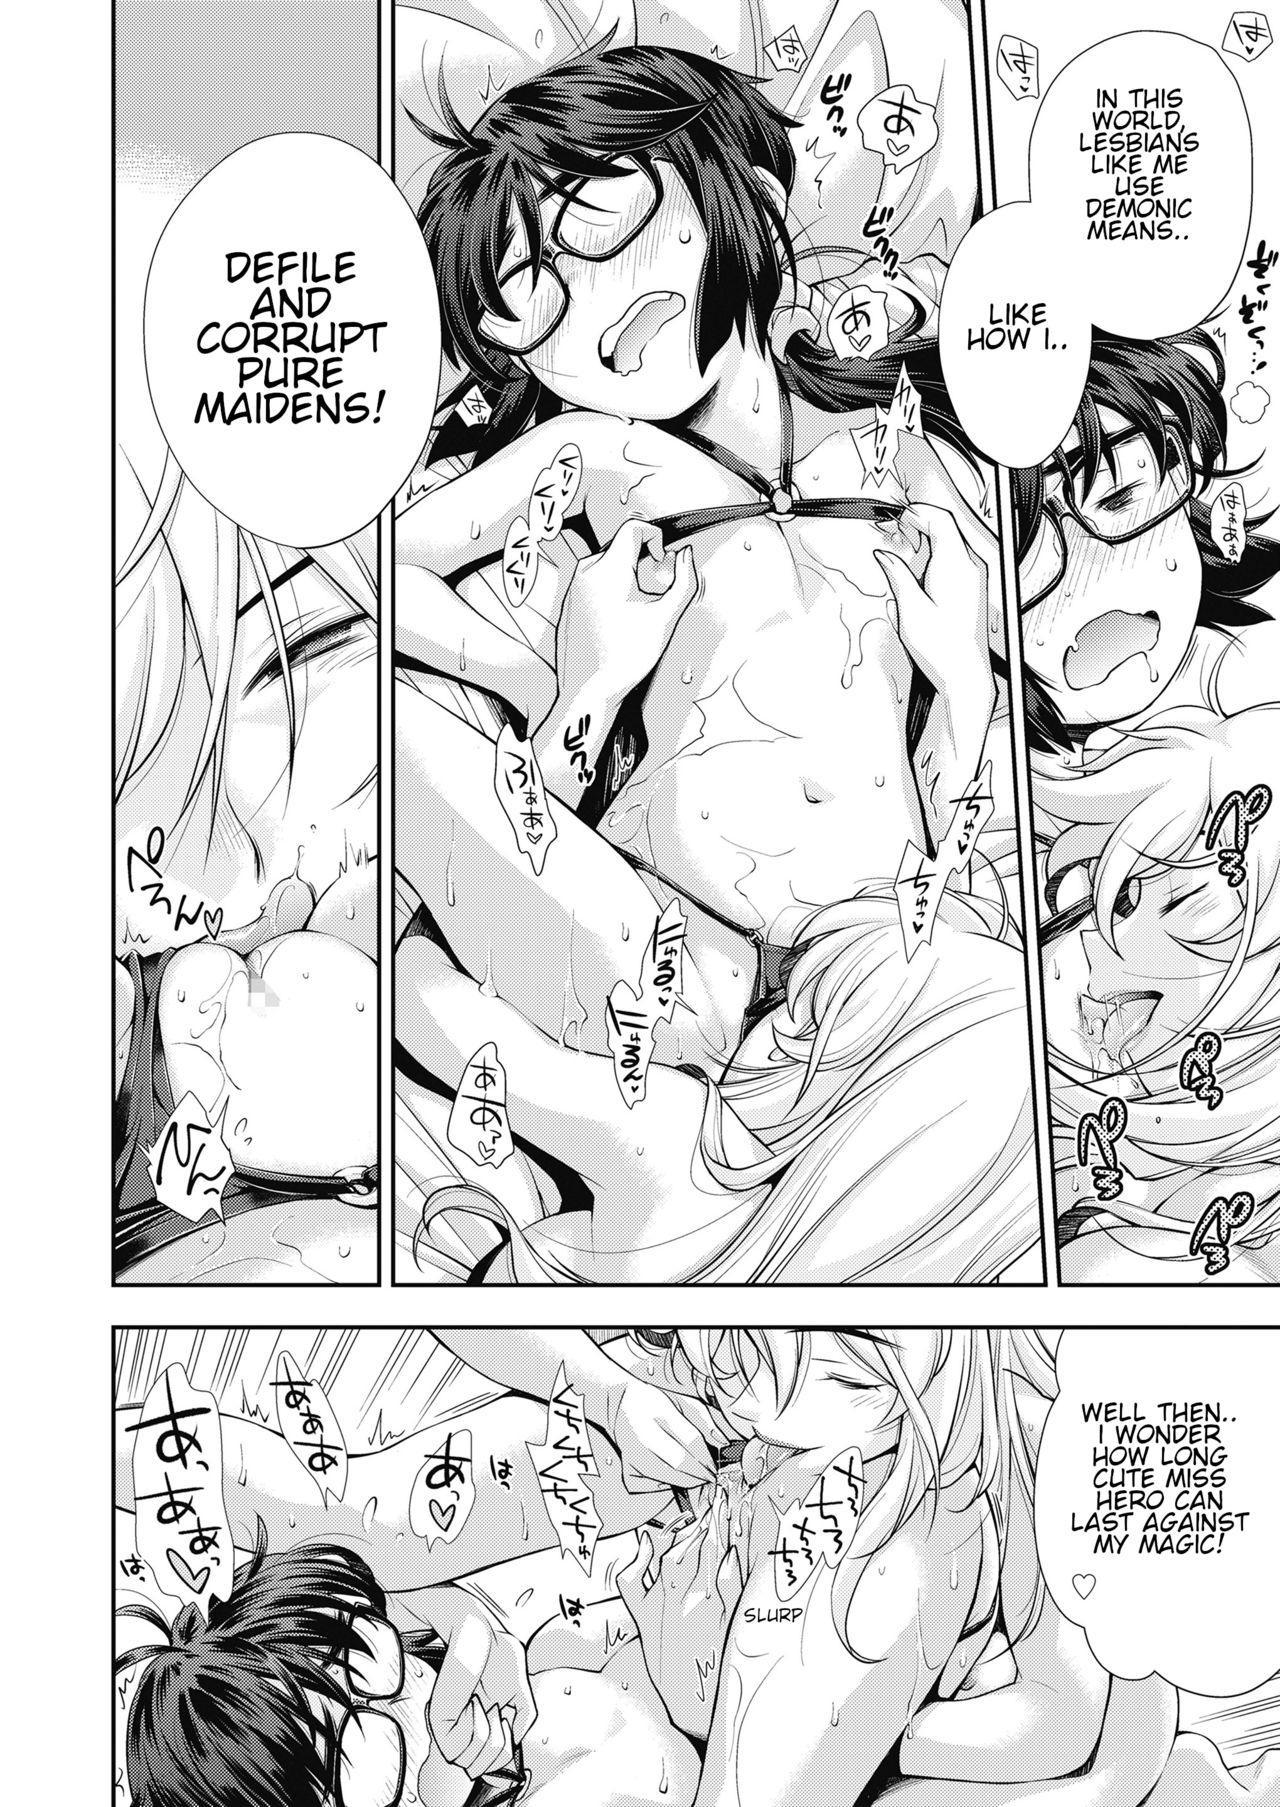 Manken JC Isekai de Yuusha ni Naru mo Les to Shokushu ni Otsu   I became a brave loli warrior in another world but fell prey to a lesbian and tentacles 9